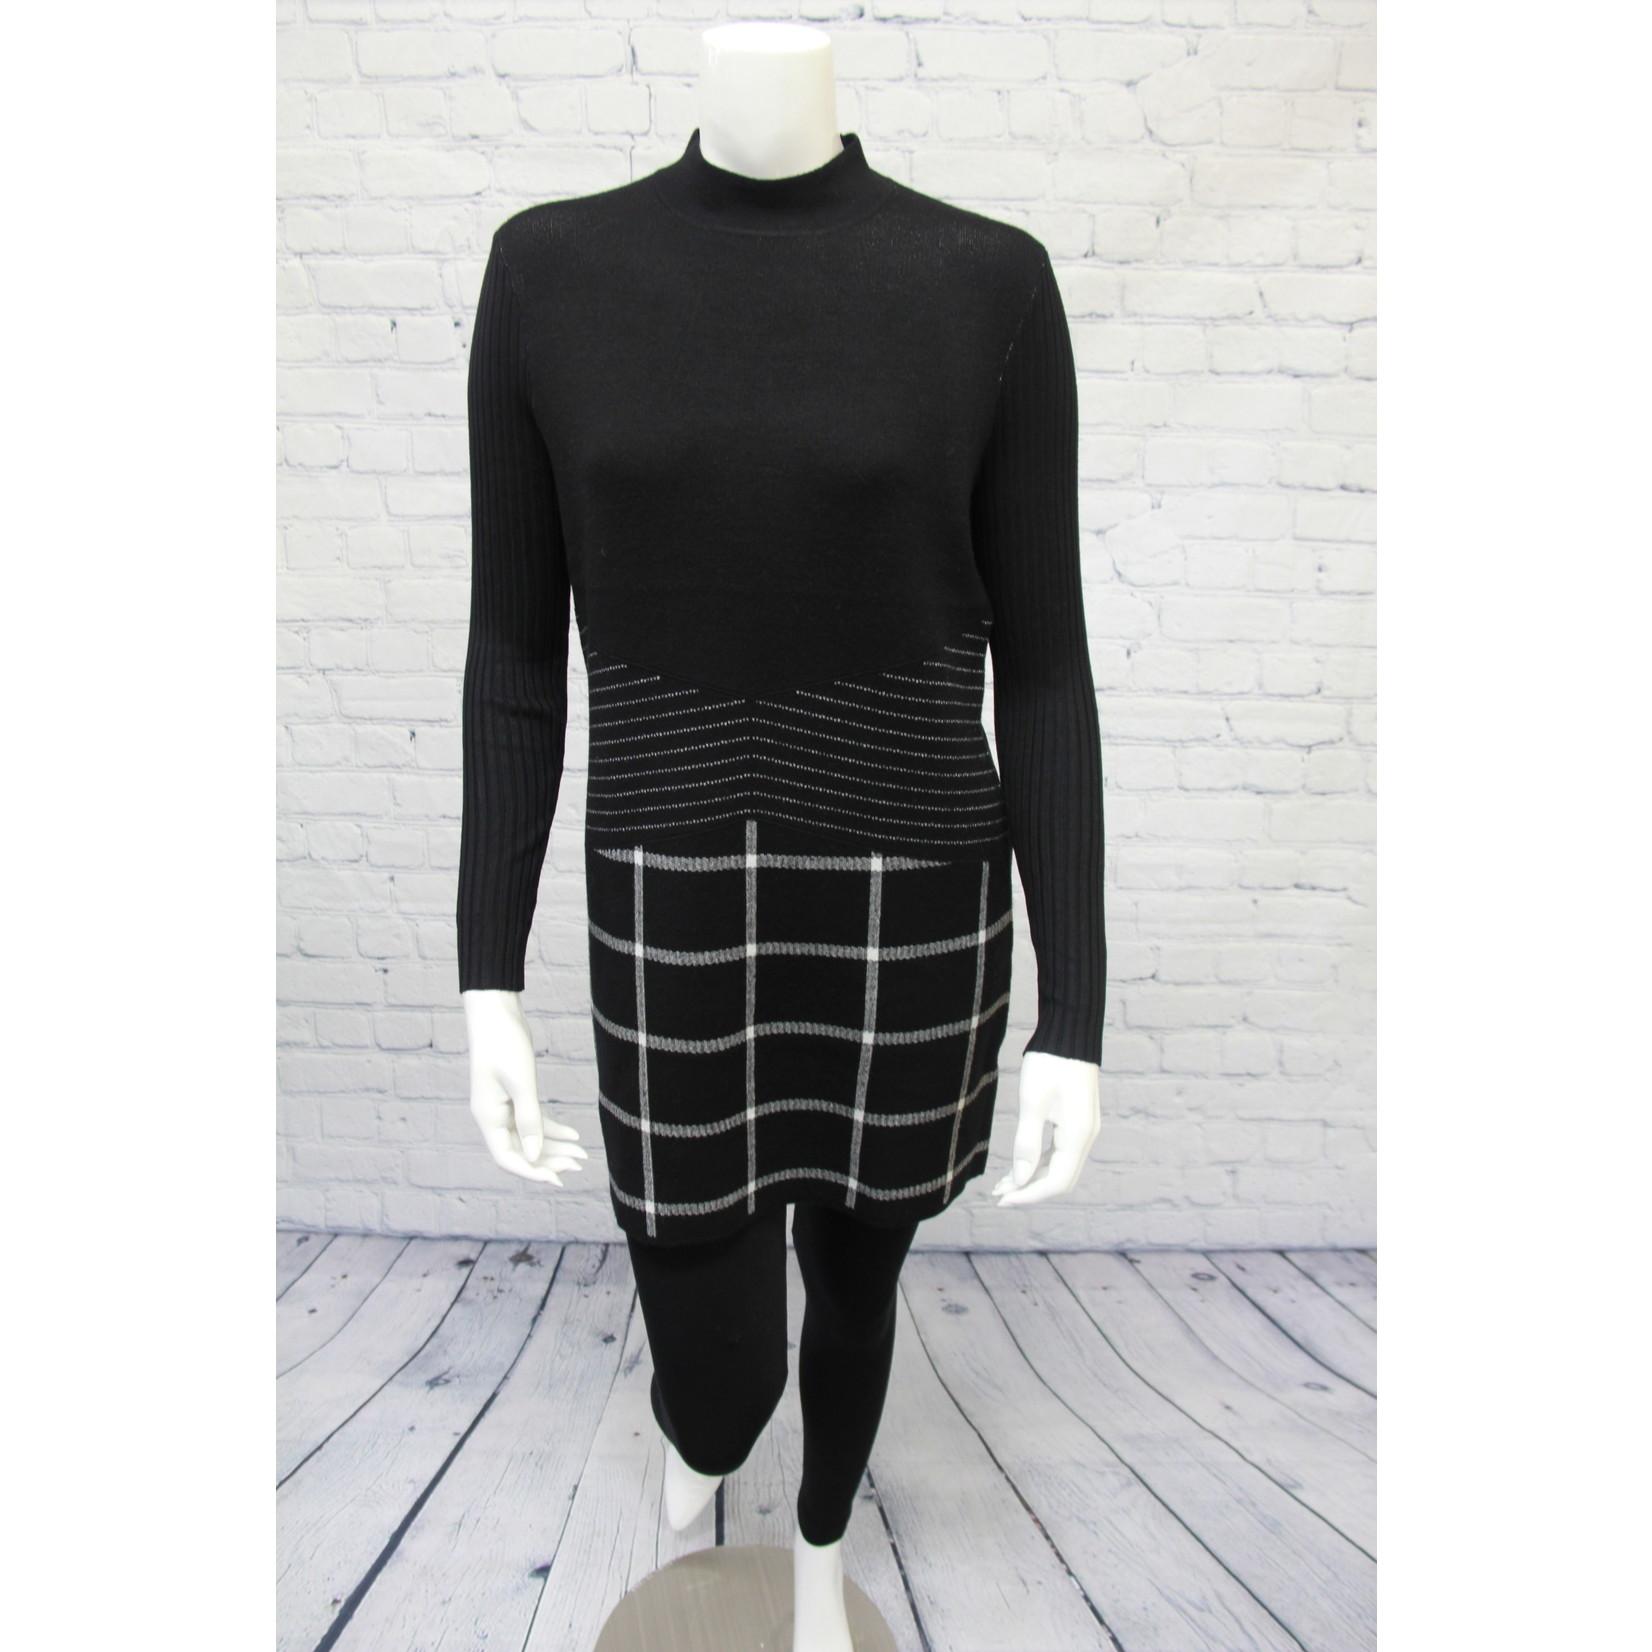 Elena Wang Sweater Tunic